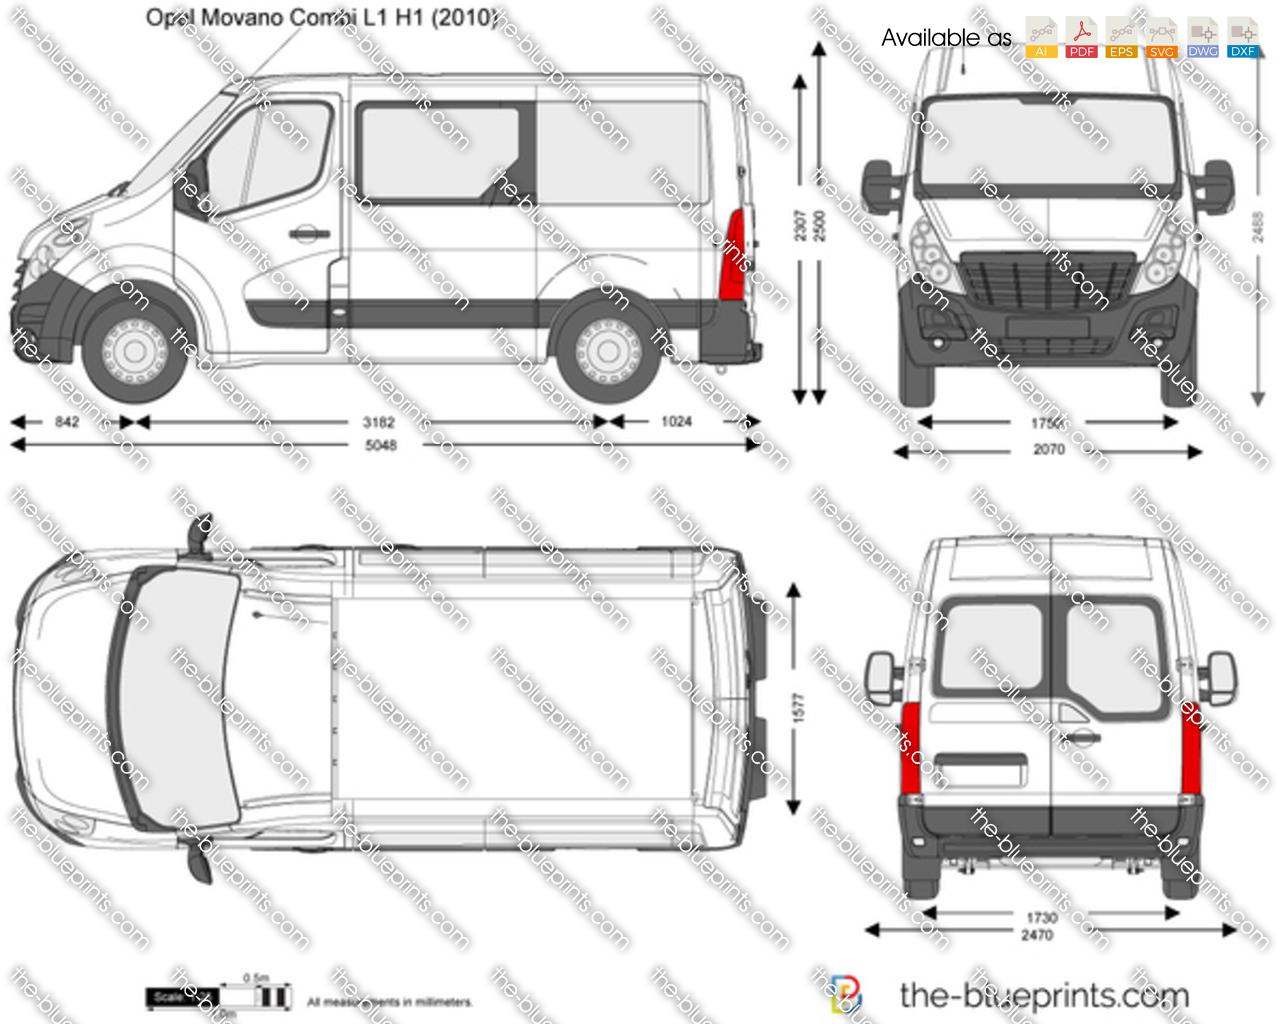 Opel Movano Combi L1 H1 vector drawing